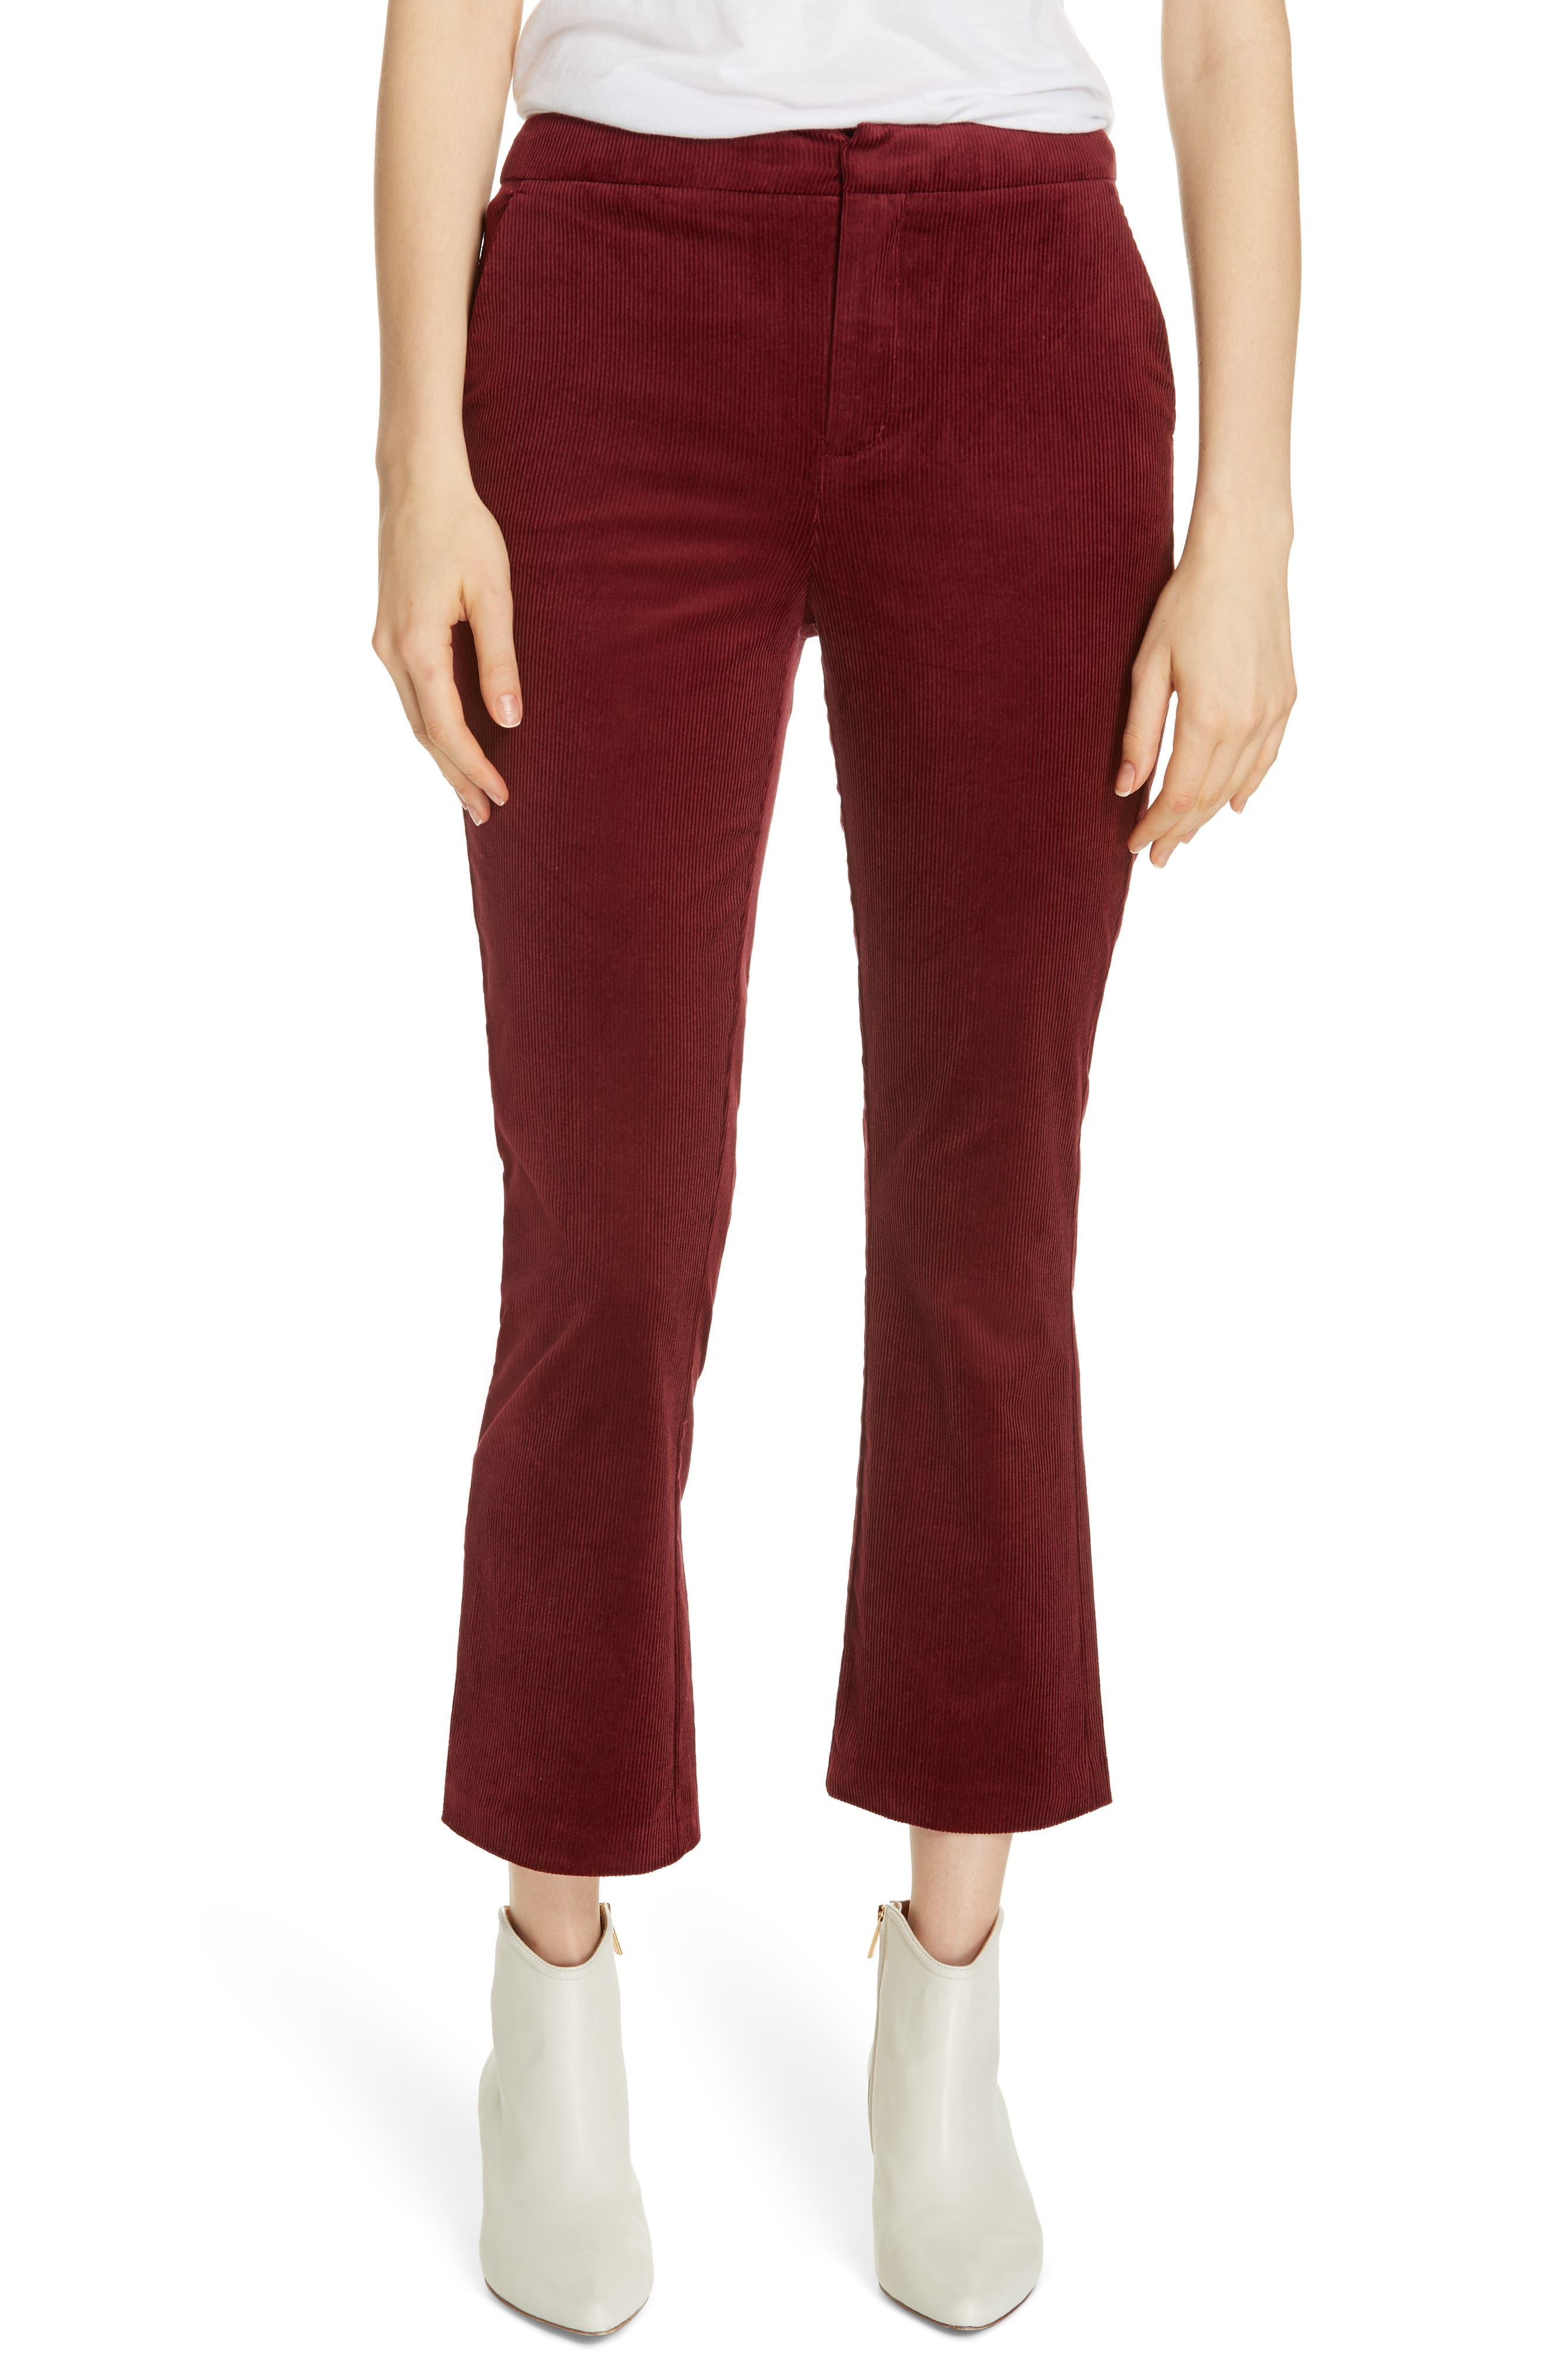 Marcena Velvet Crop Flared Pants,                             Main thumbnail 1, color,                             BLACKBERRY